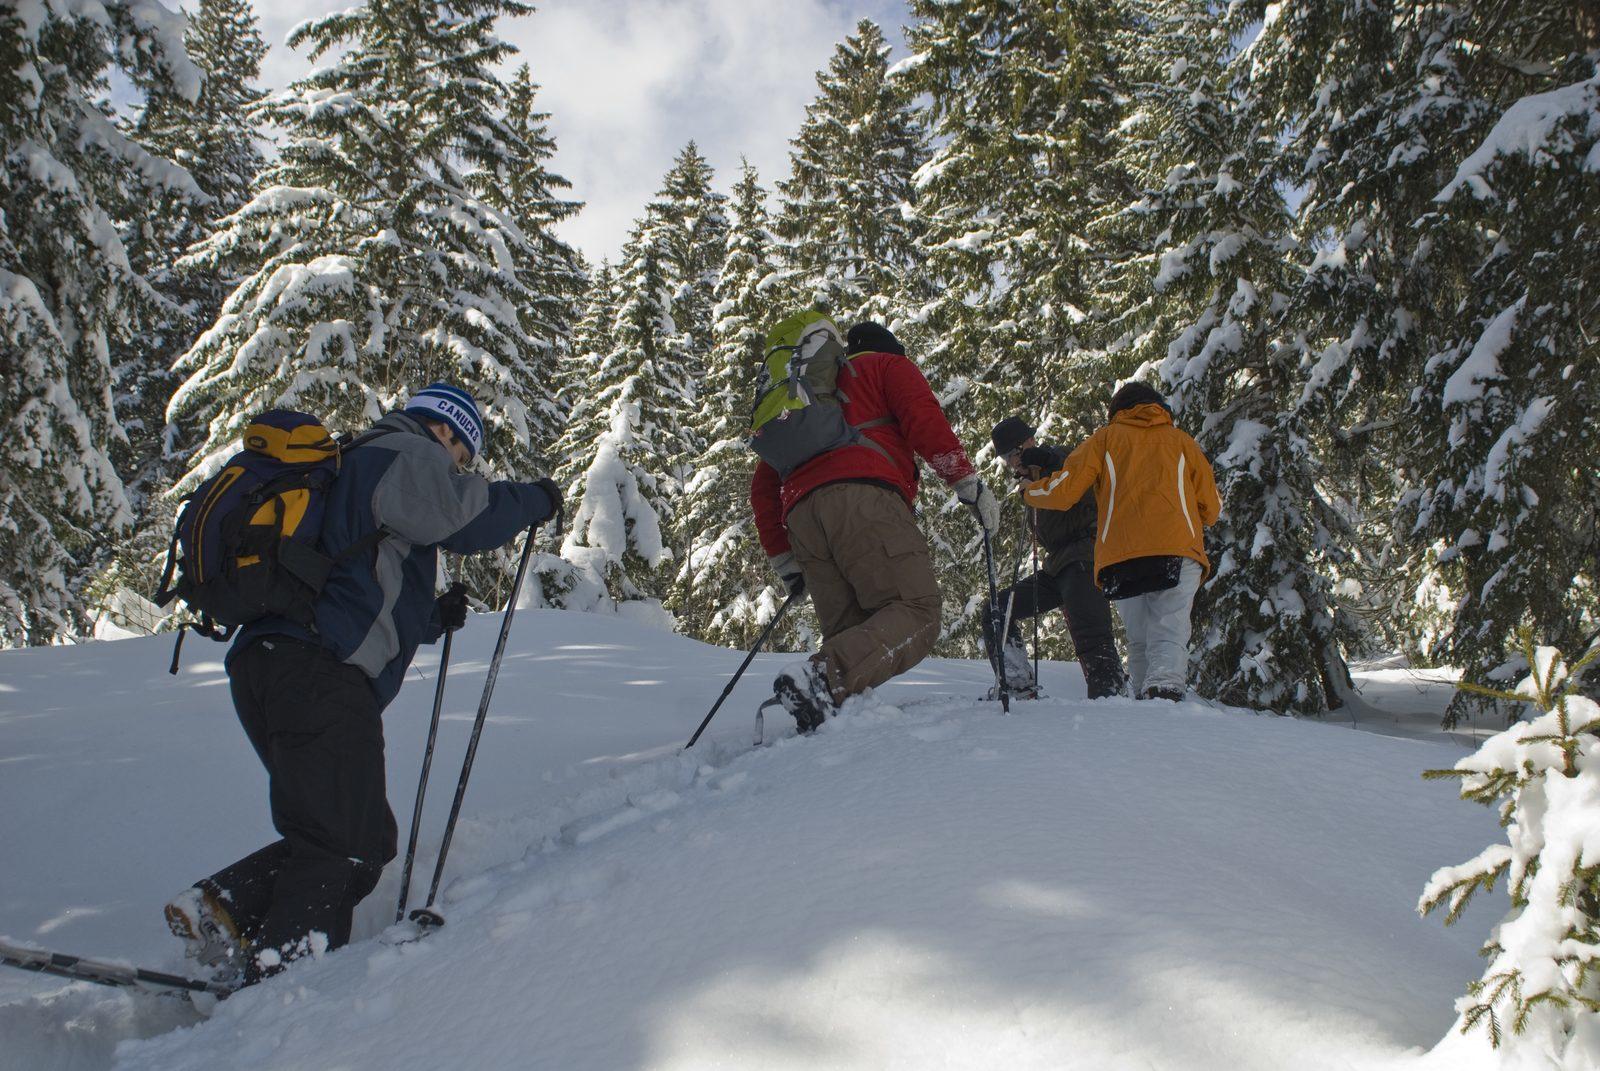 St. Gallen's most beautiful hiking trails